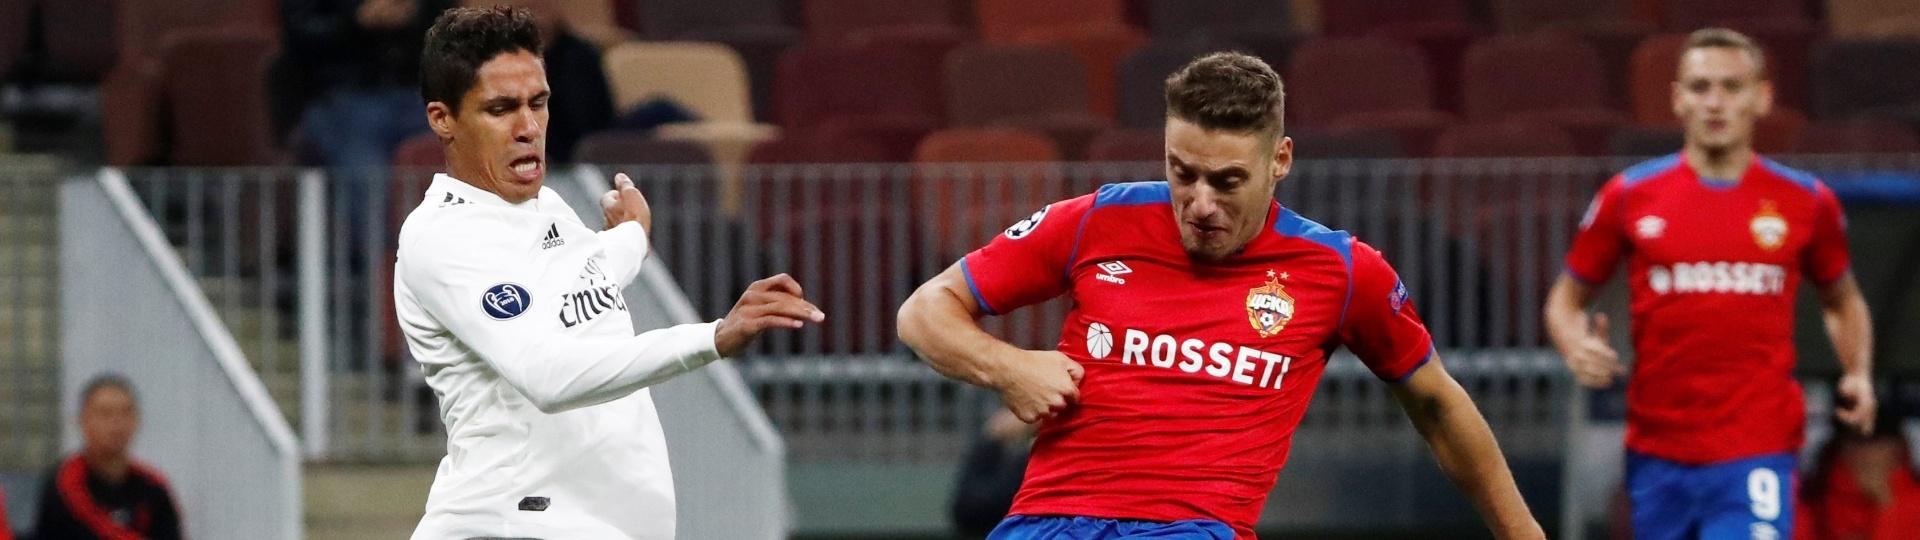 Vlasic chuta e faz gol para o CSKA contra o Real Madrid